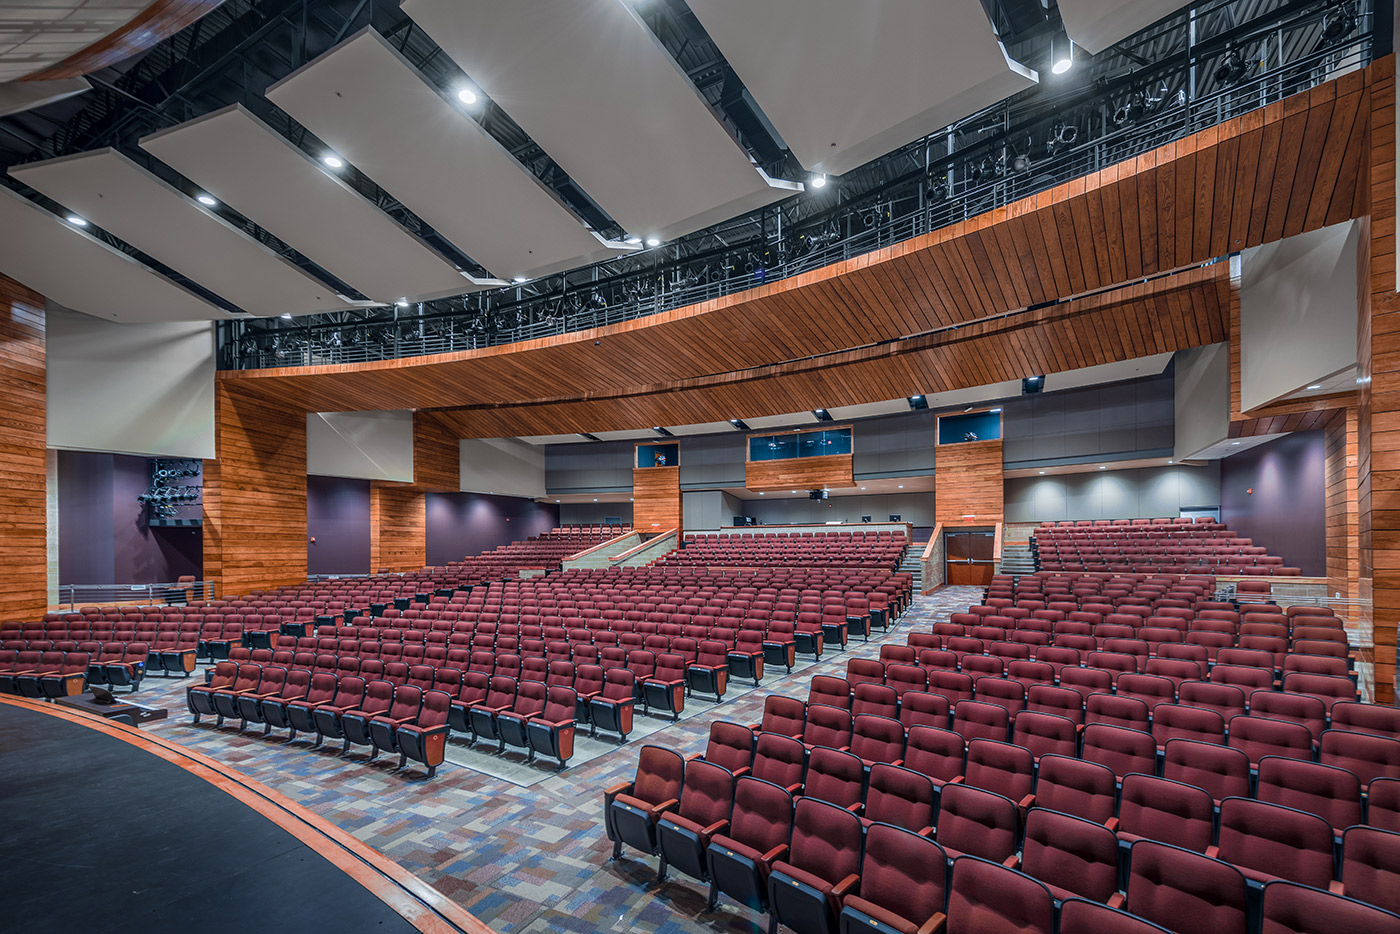 Designer Consignment Furniture And Interiors Shawnee Ks ~ Htk architects shawnee heights high school auditorium